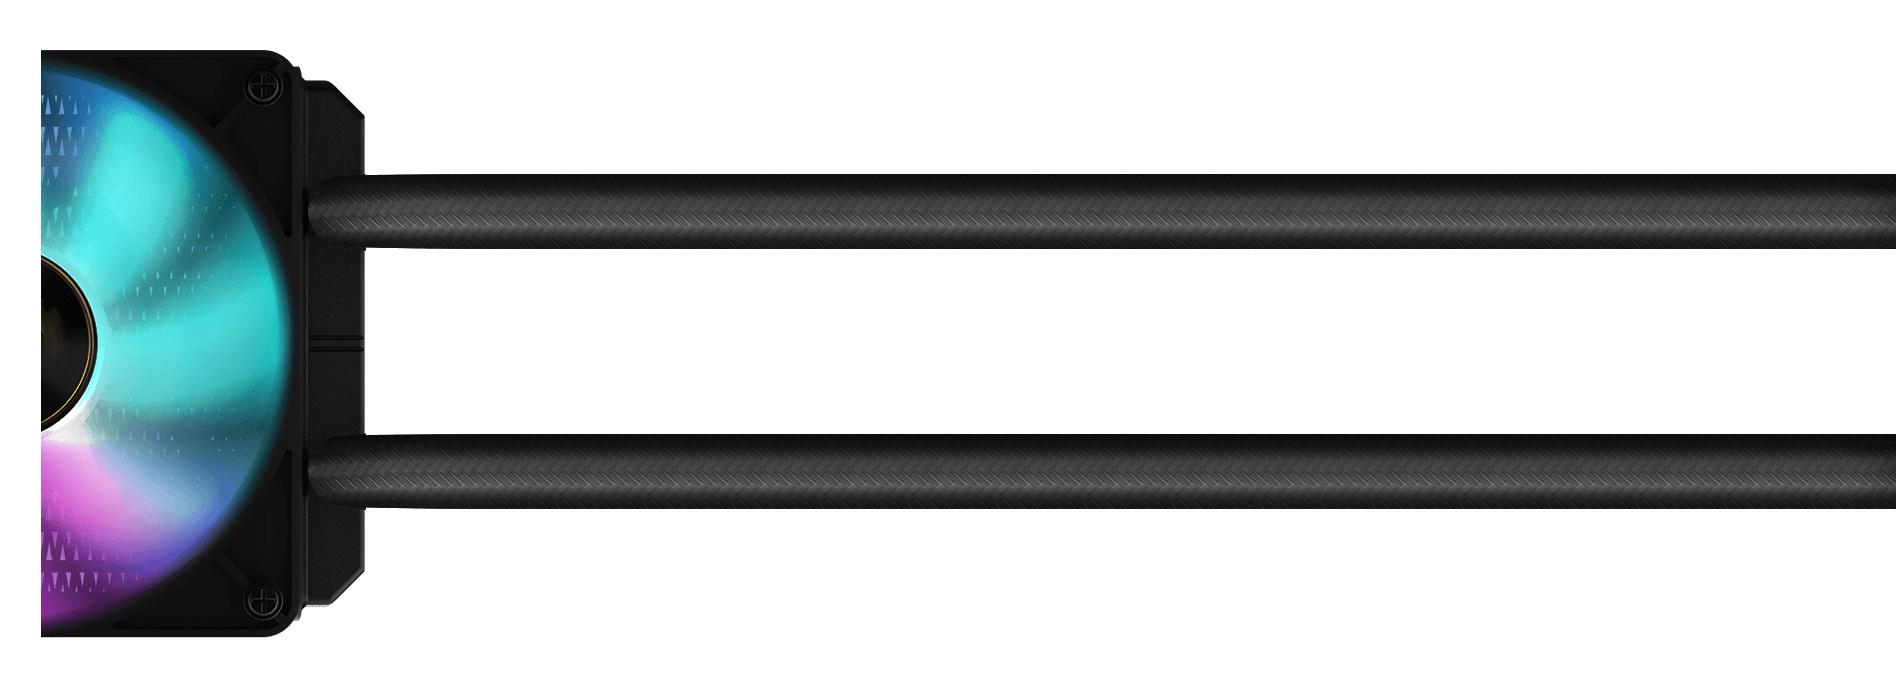 AORUS GeForce RTX 3090 XTREME WATERFORCE 24G